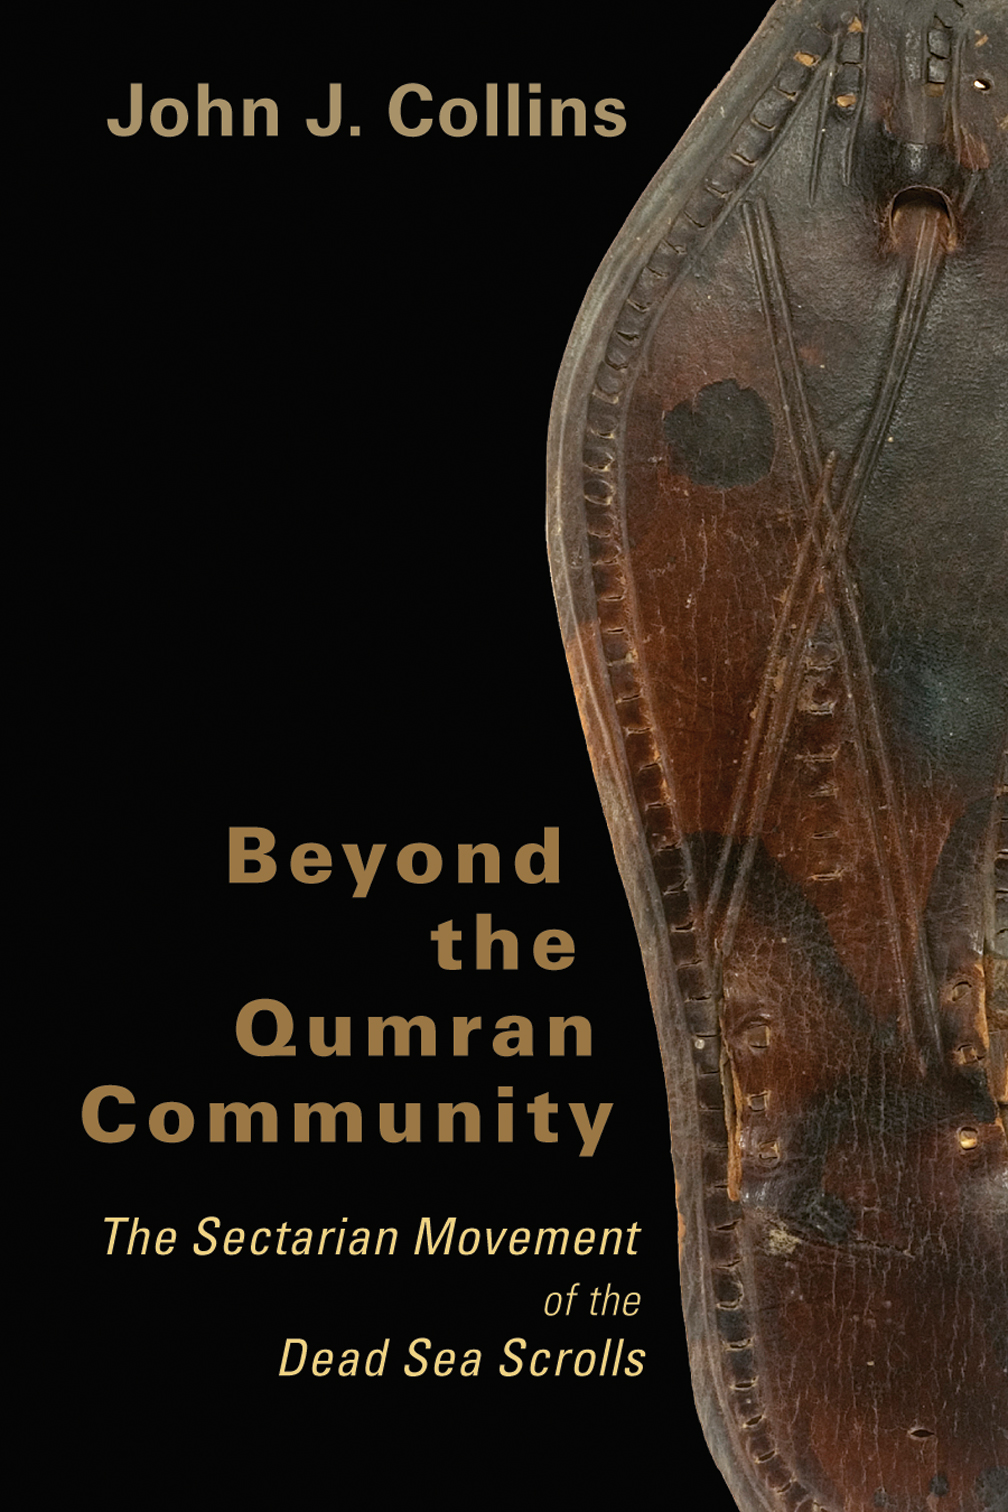 Book Review: John J. Collins, Beyond the Qumran Community